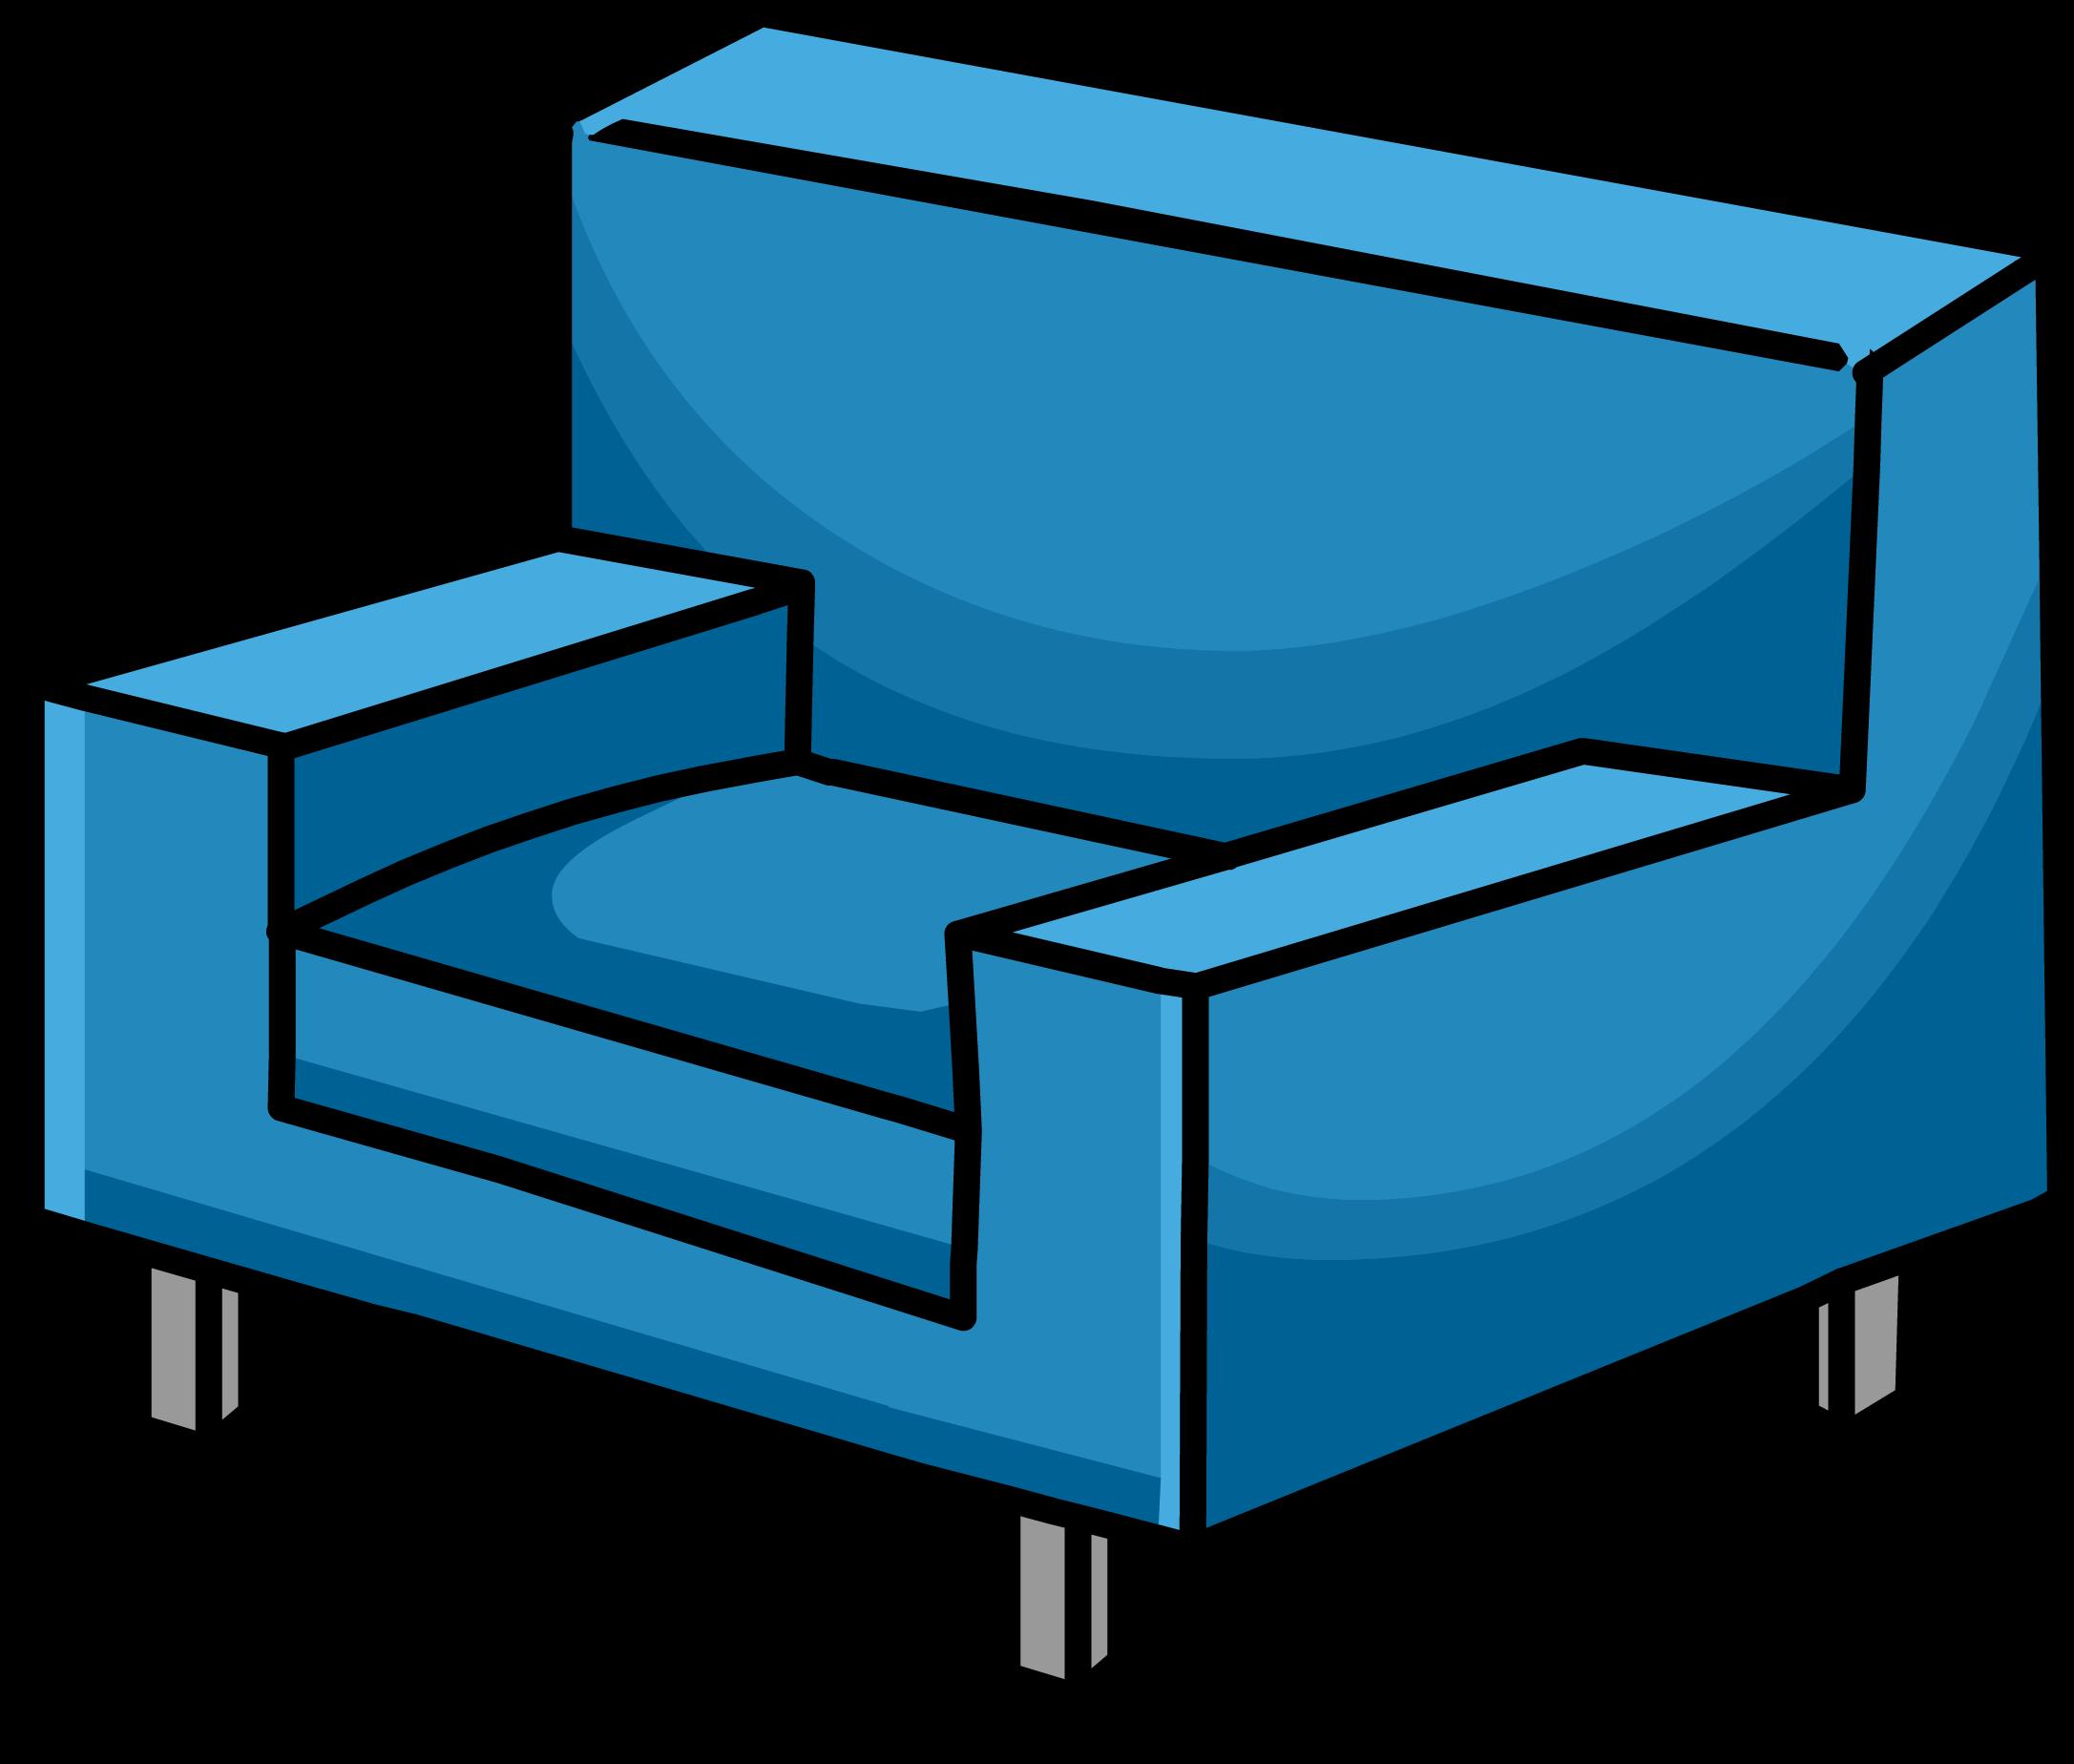 Furniture clipart electric fan. Image modern chair sprite